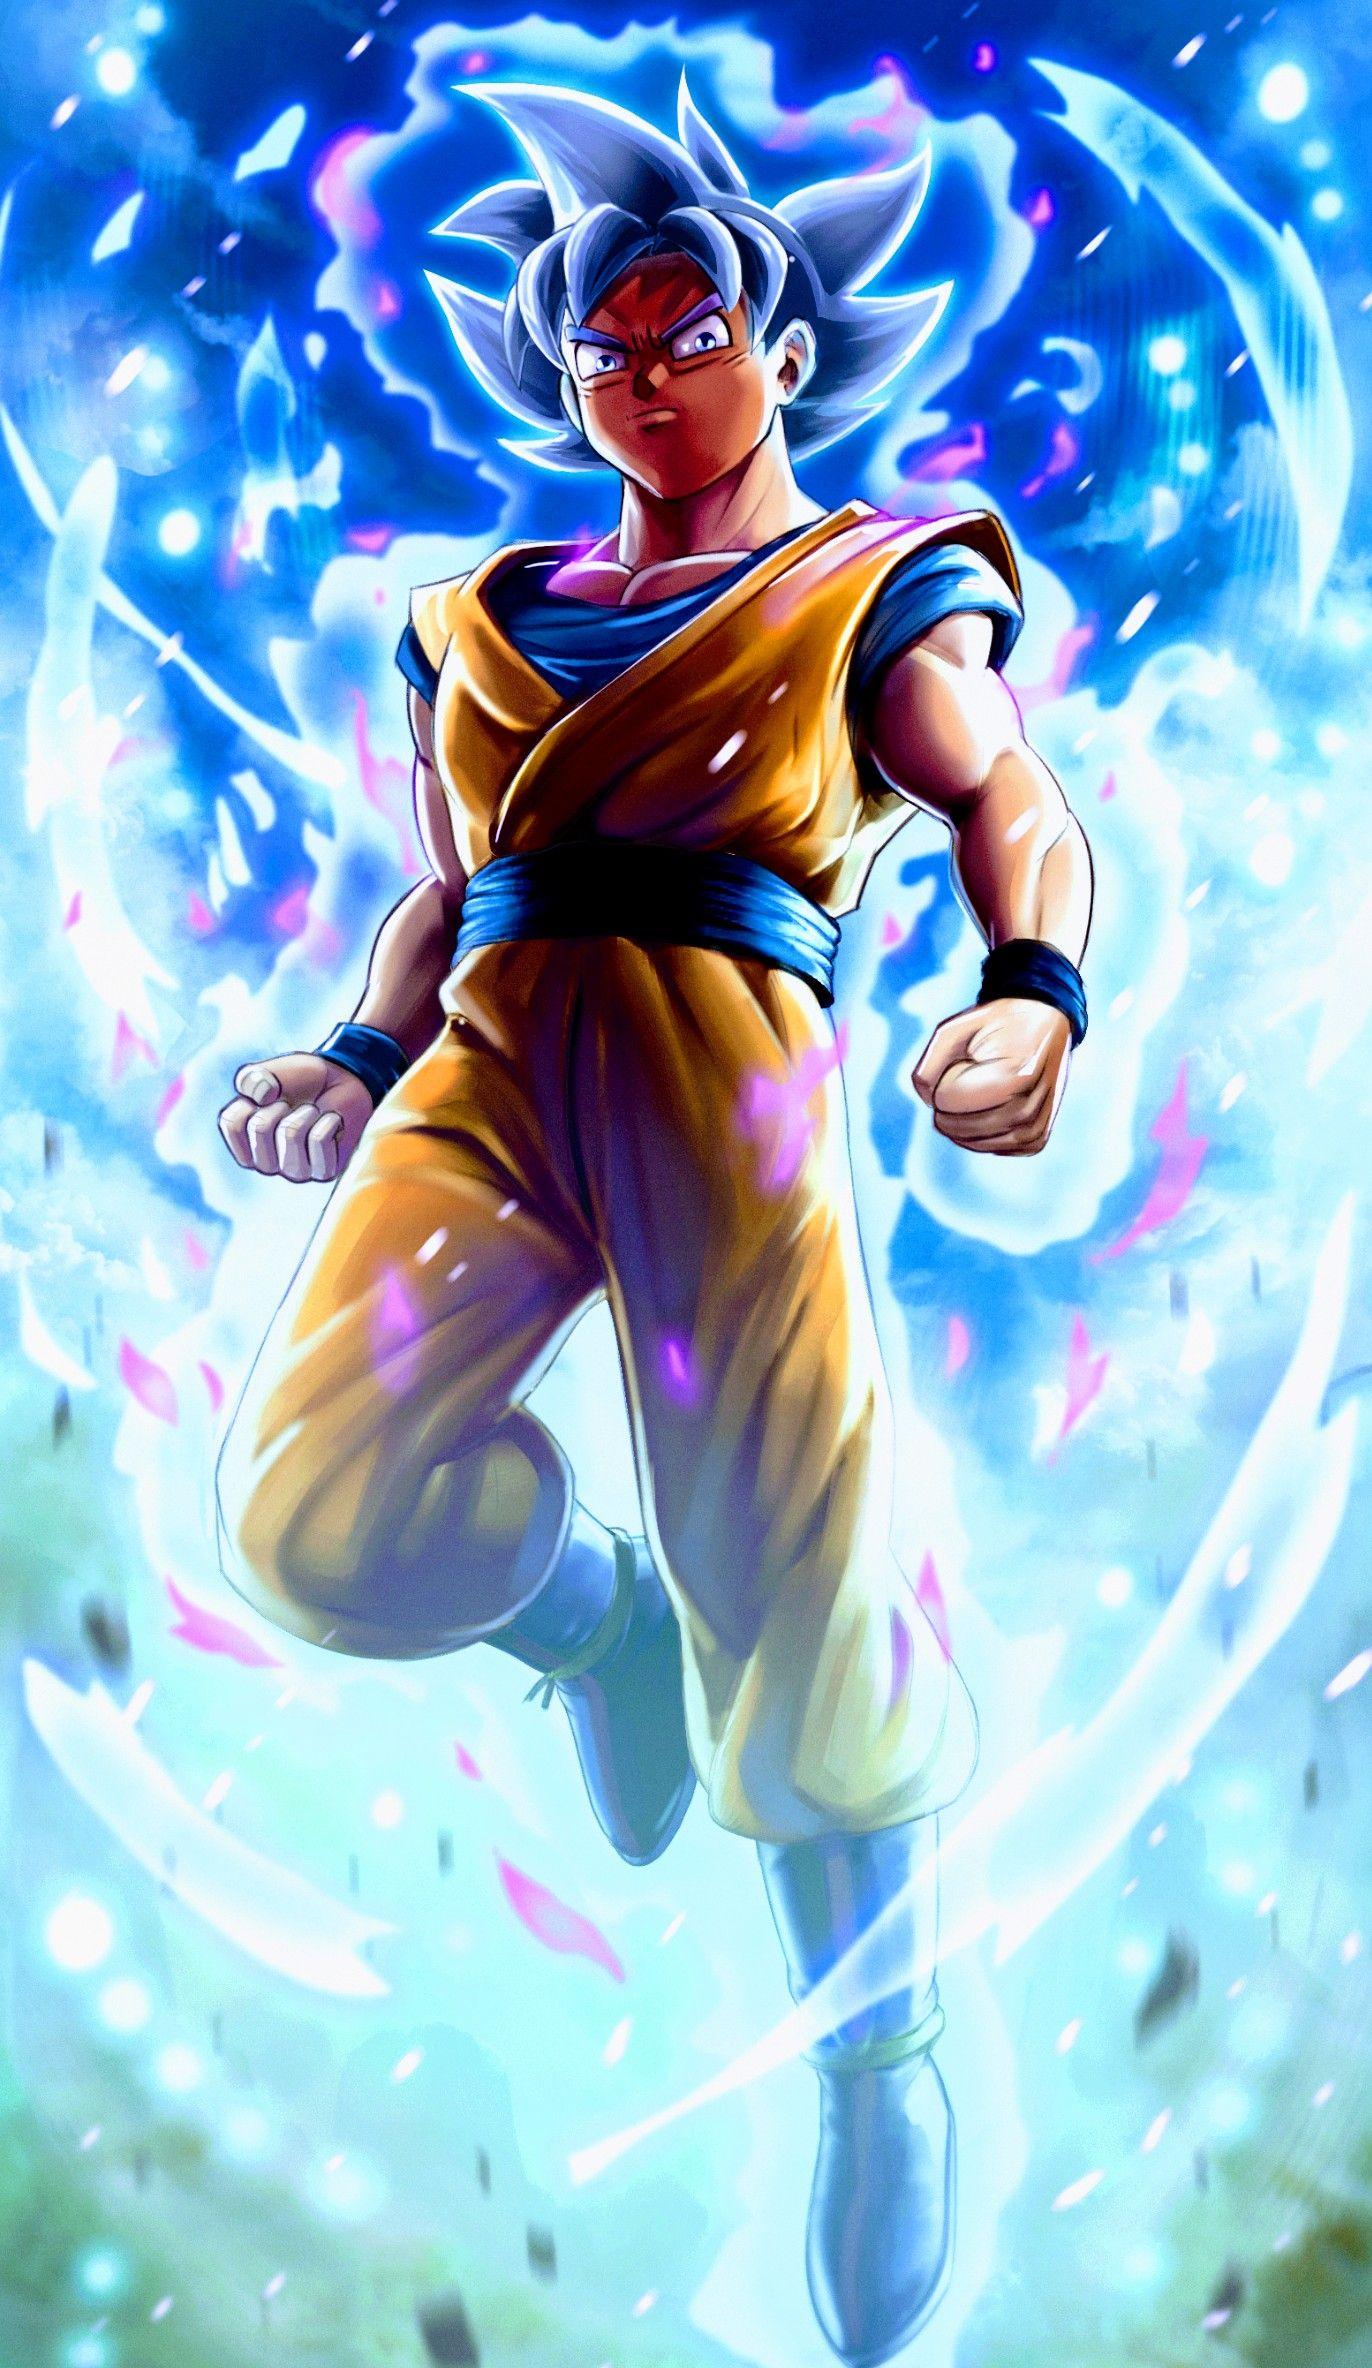 Goku Ultra Instinct Mastered Dragon Ball Super Anime Dragon Ball Super Dragon Ball Super Manga Dragon Ball Super Goku